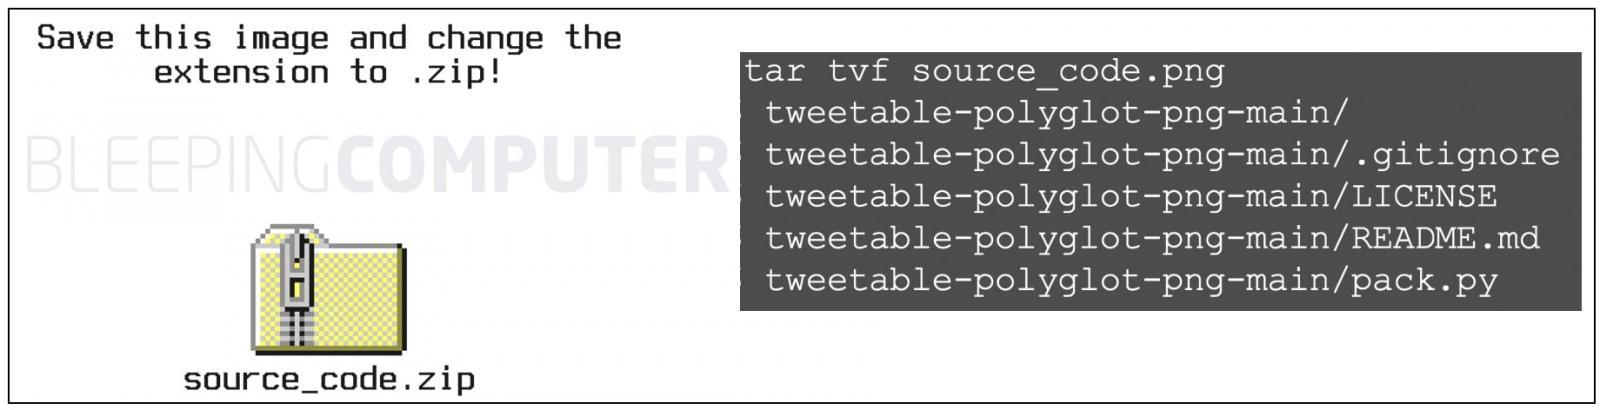 Code postal du code source dans l'image